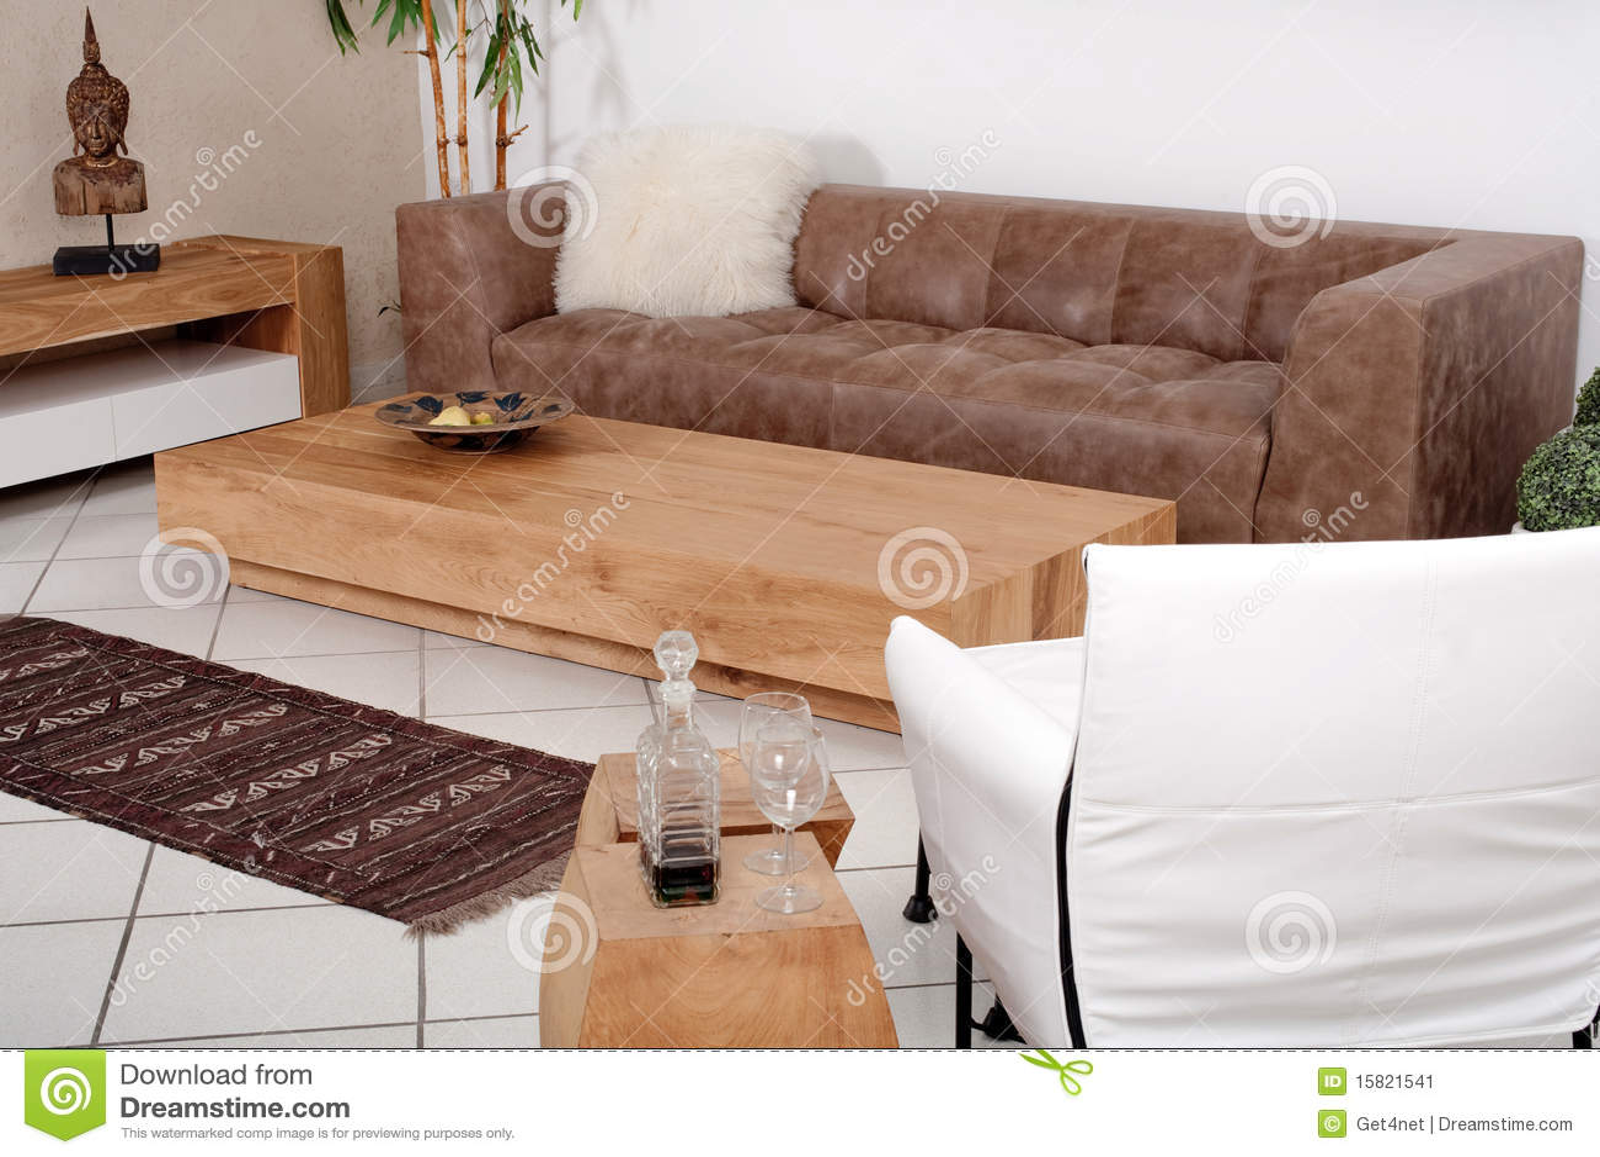 Interiores modernos lujosos imagen de archivo imagen - Muebles de interior modernos ...